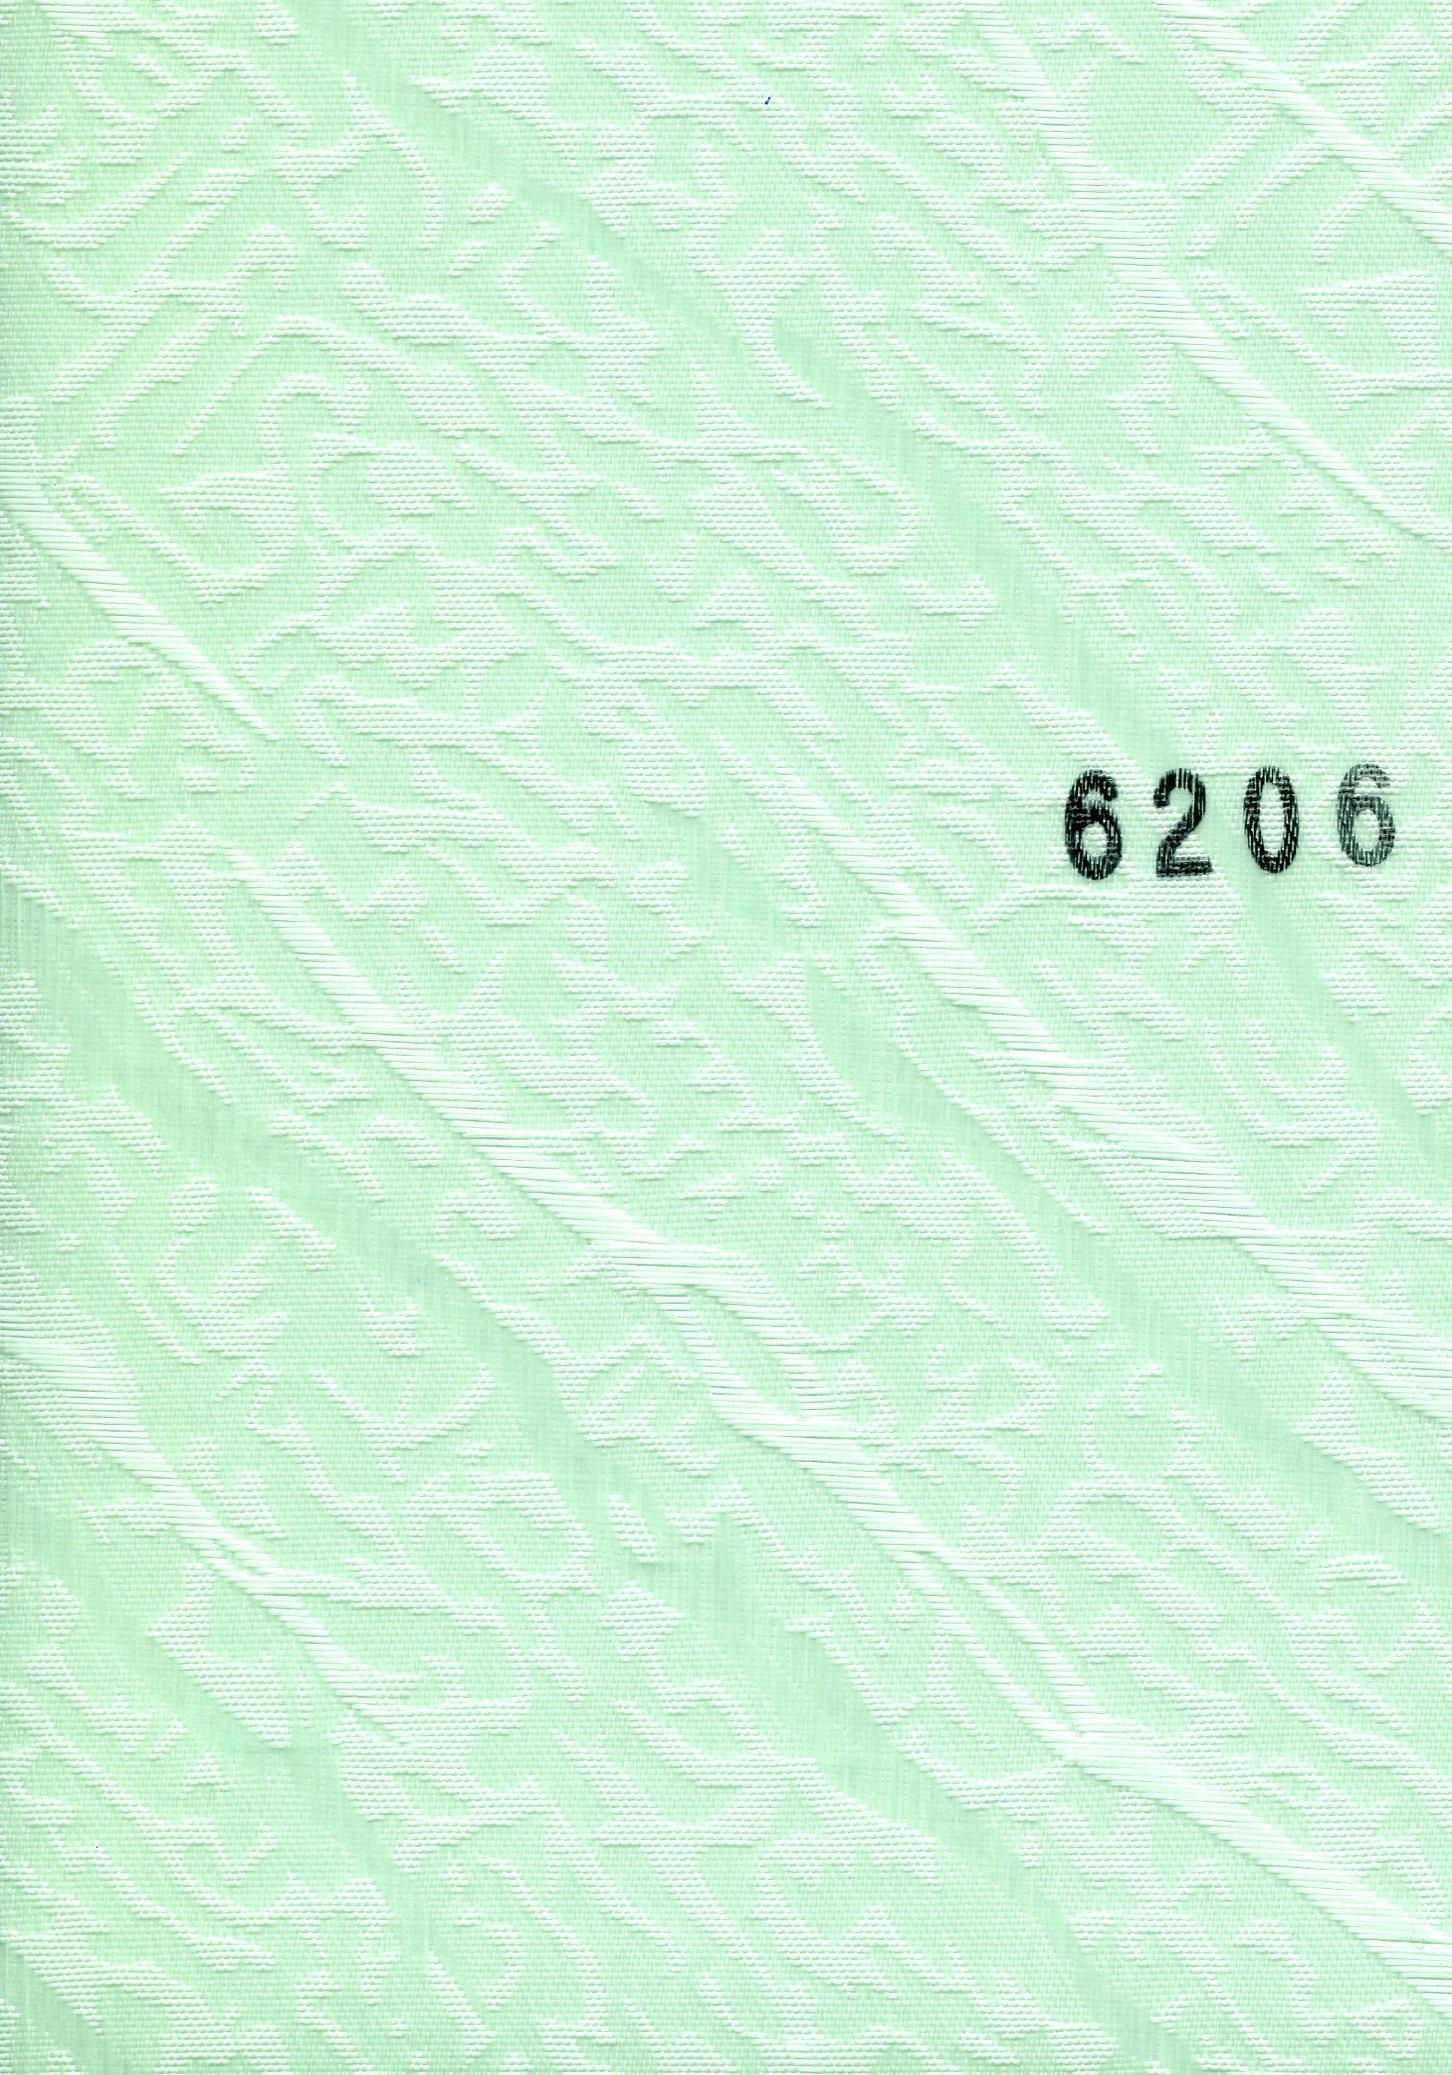 Amsterdam 6206